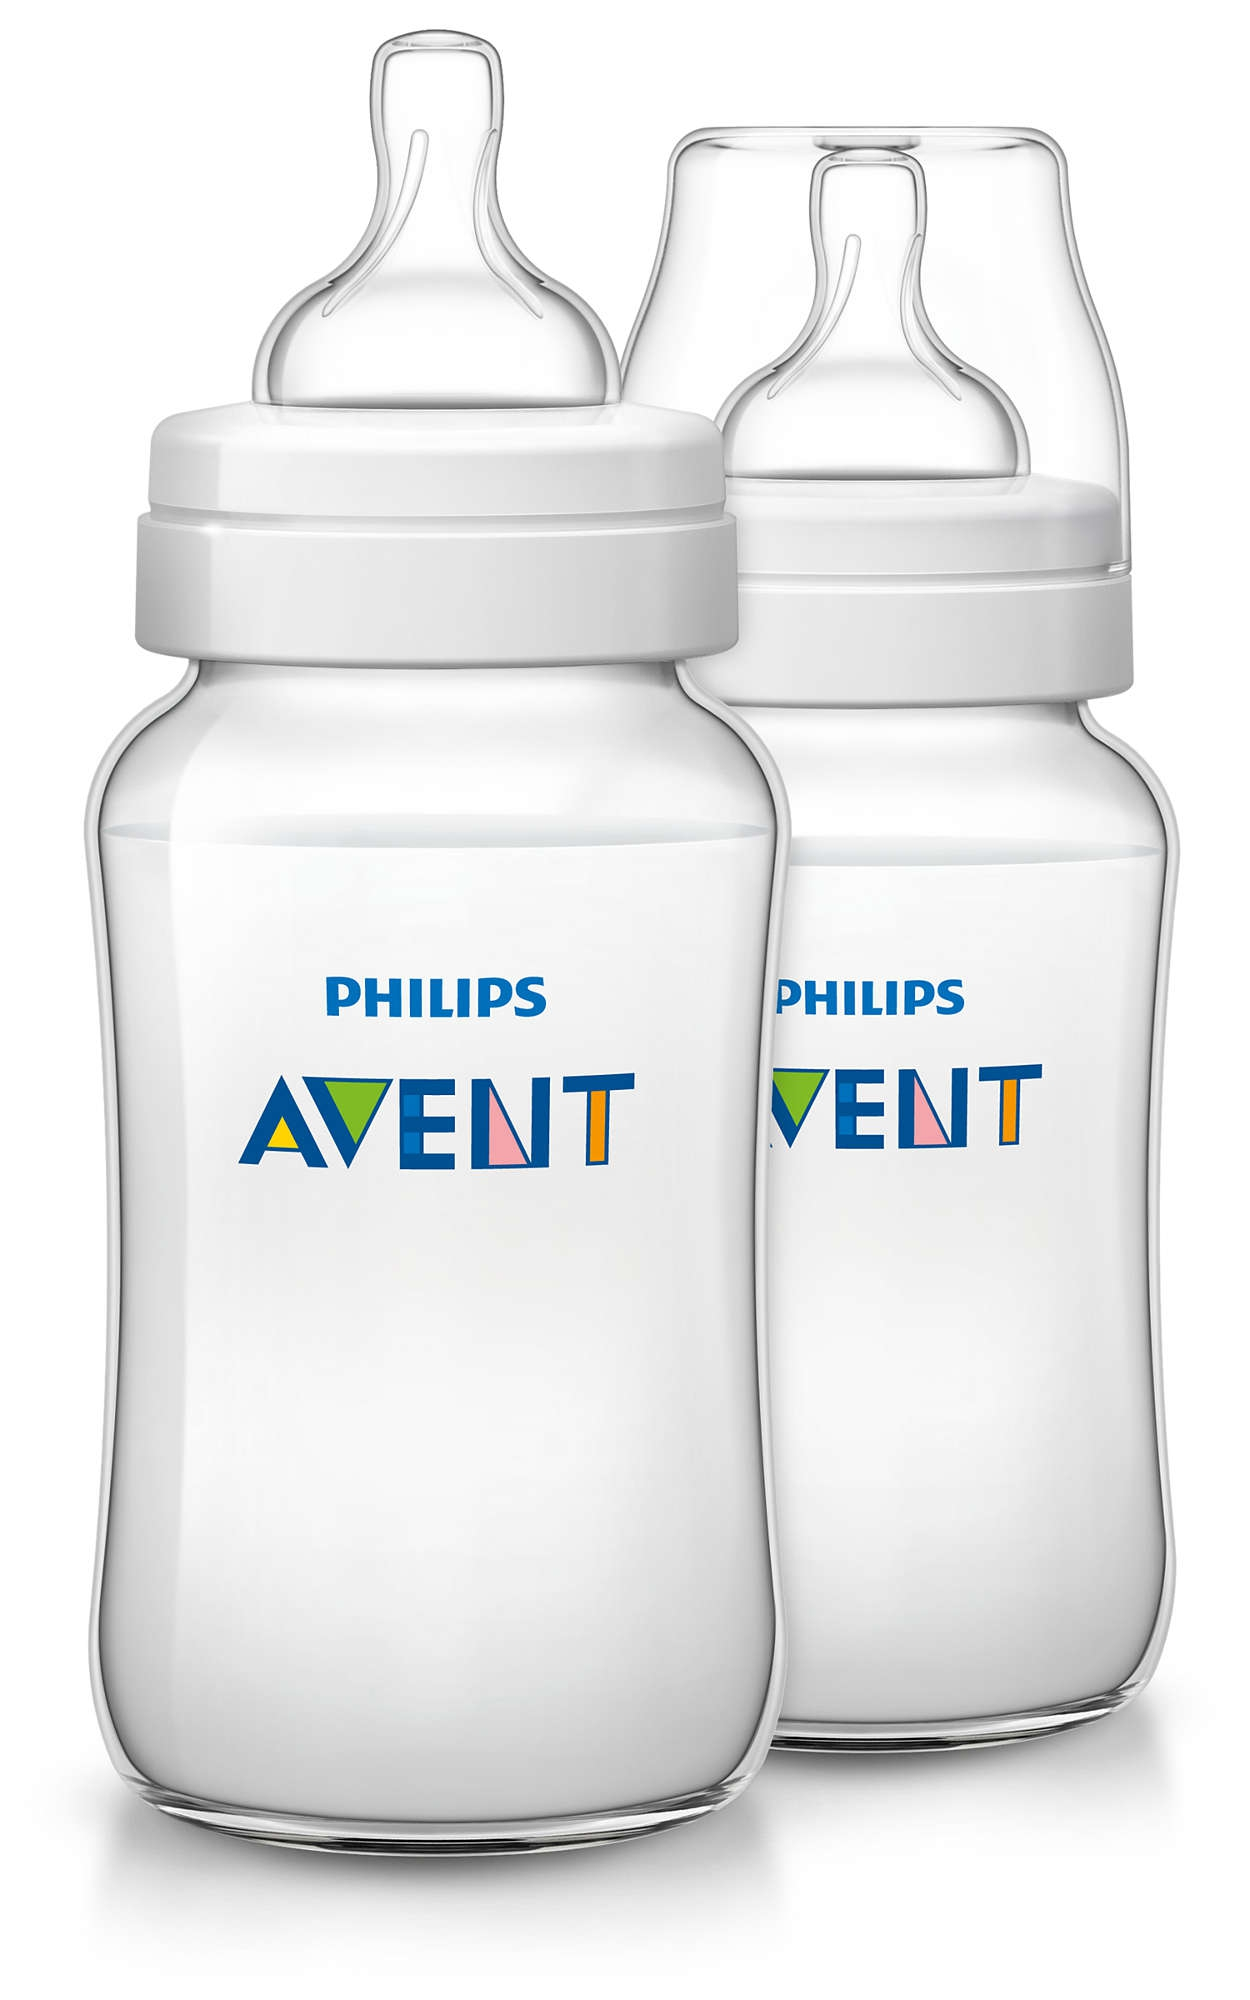 Бутылочки Philips AVENT Бутылочка Philips AVENT «Classic+» с силиконовой соской с 3 мес. 330 мл (2 бутылочки) бутылочка philips avent для кормления 330 мл с 3 мес 86475